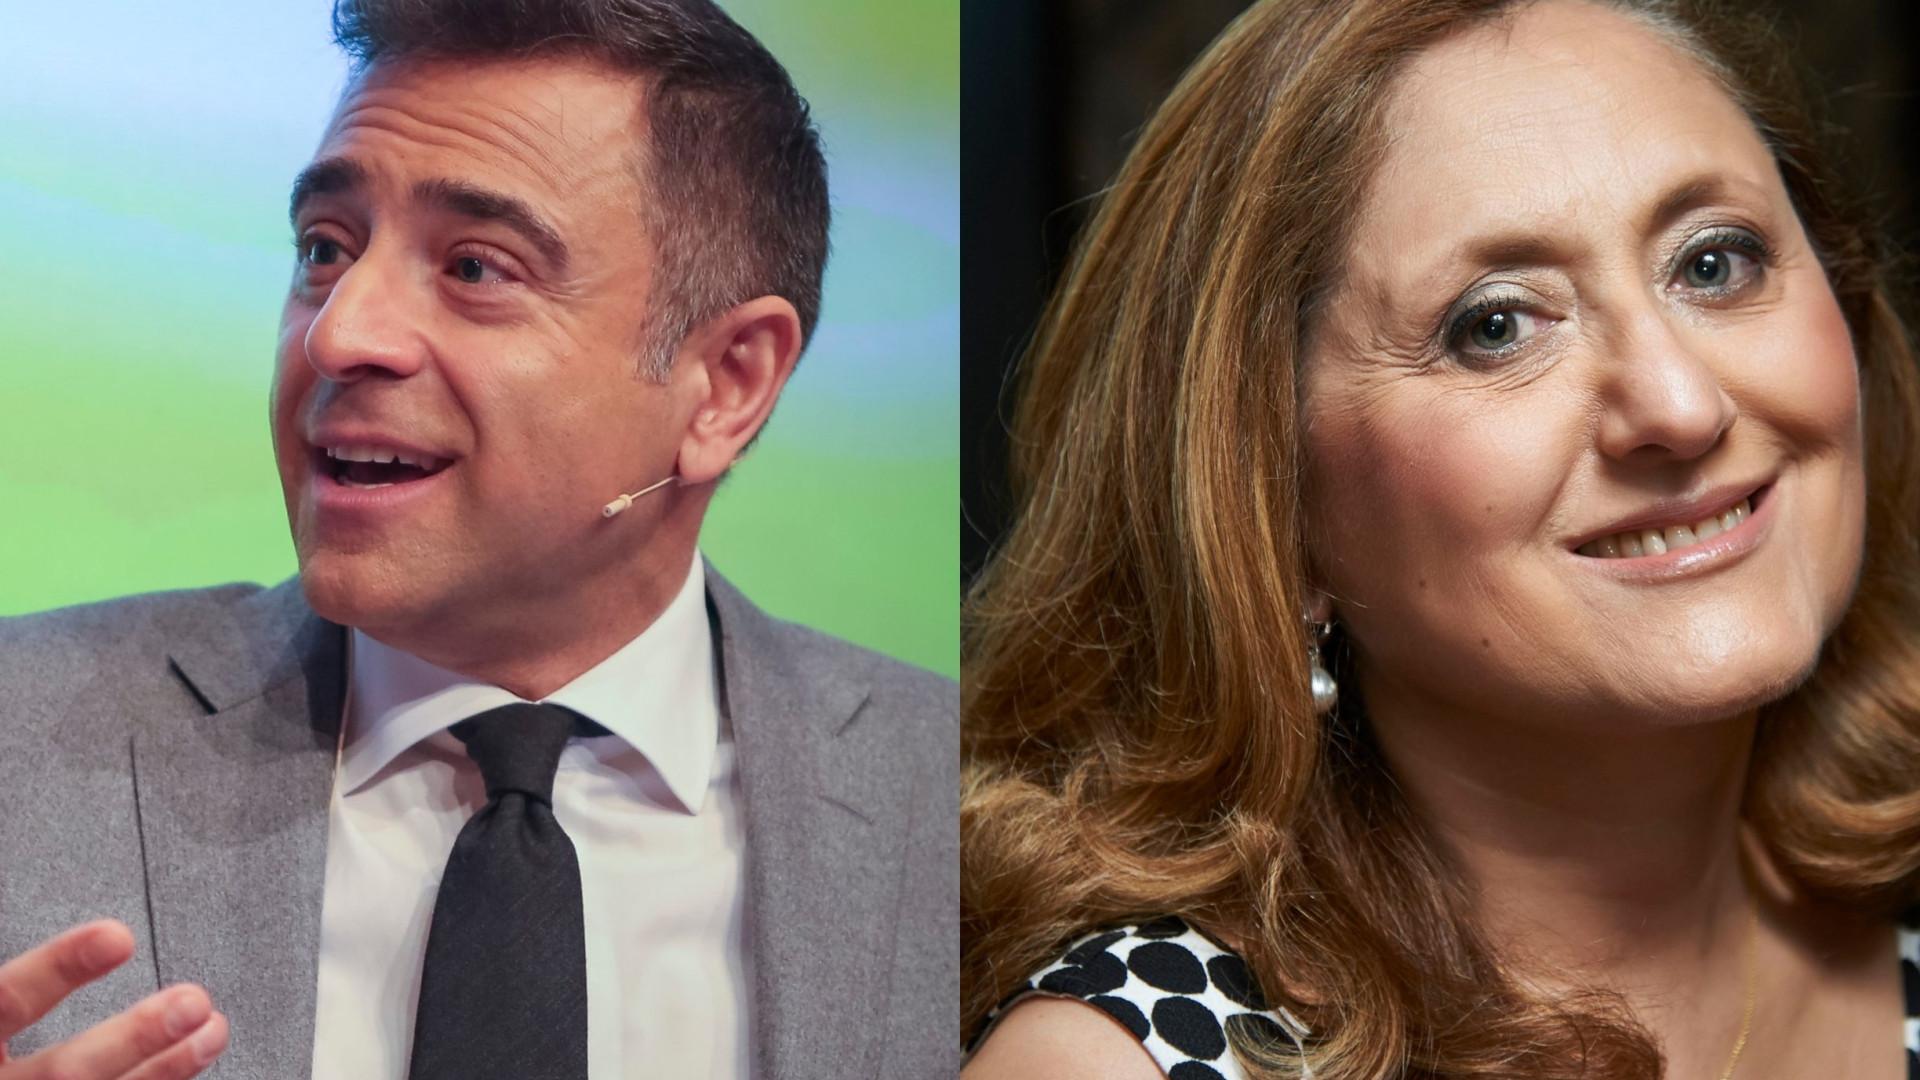 Pior pivot da TV? João Adelino Faria responde a Maria Elisa Domingues